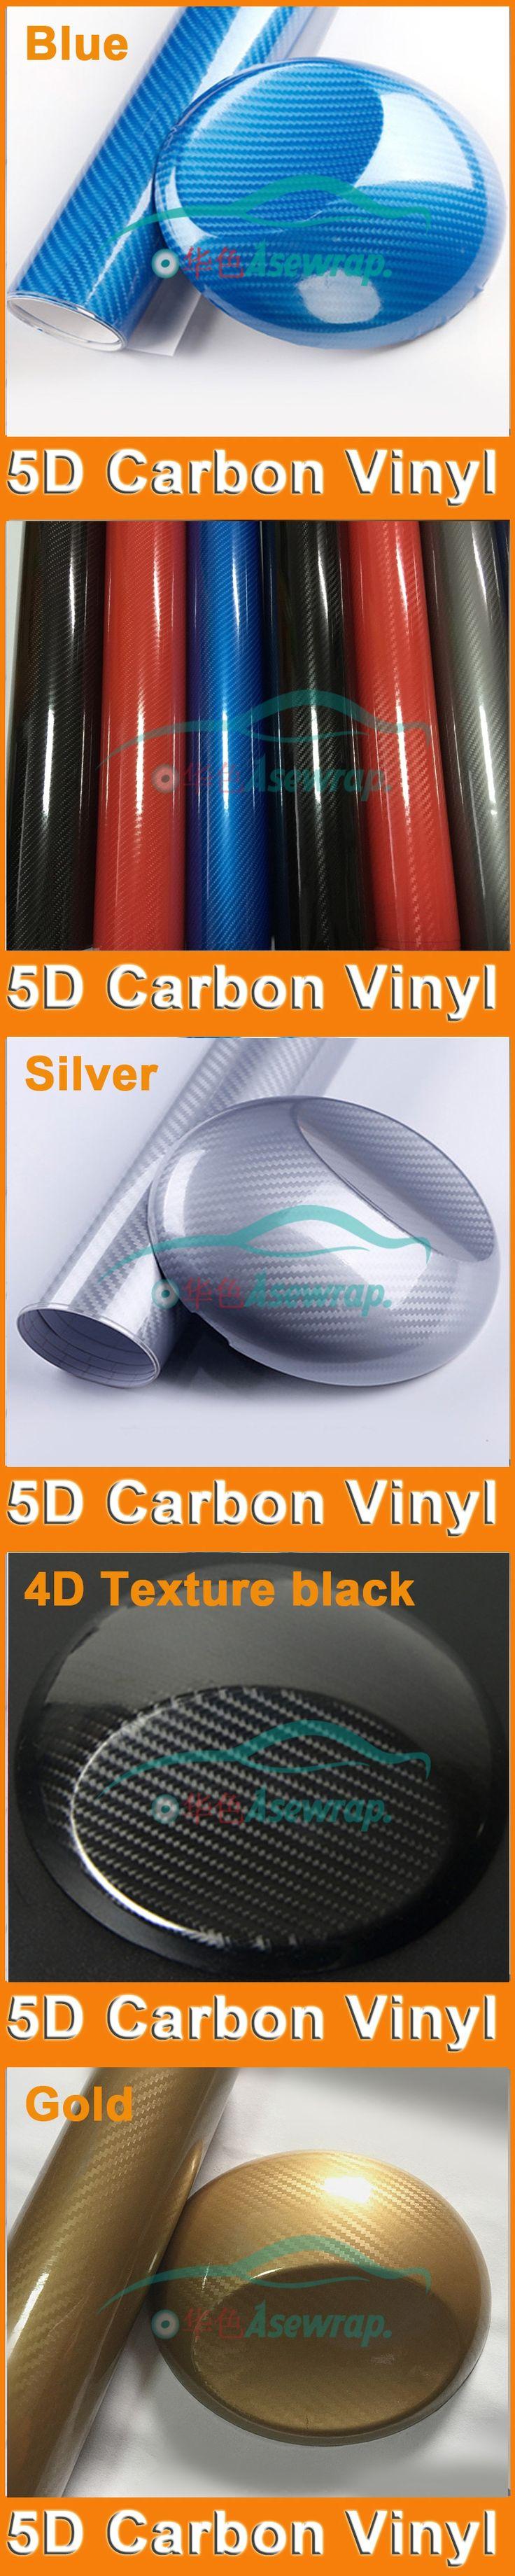 Free shipping retail Super quality 5D Carbon Fiber Vinyl car sticker car Wrap 5D Carbon Fiber Film For Vehicle Motorcycle